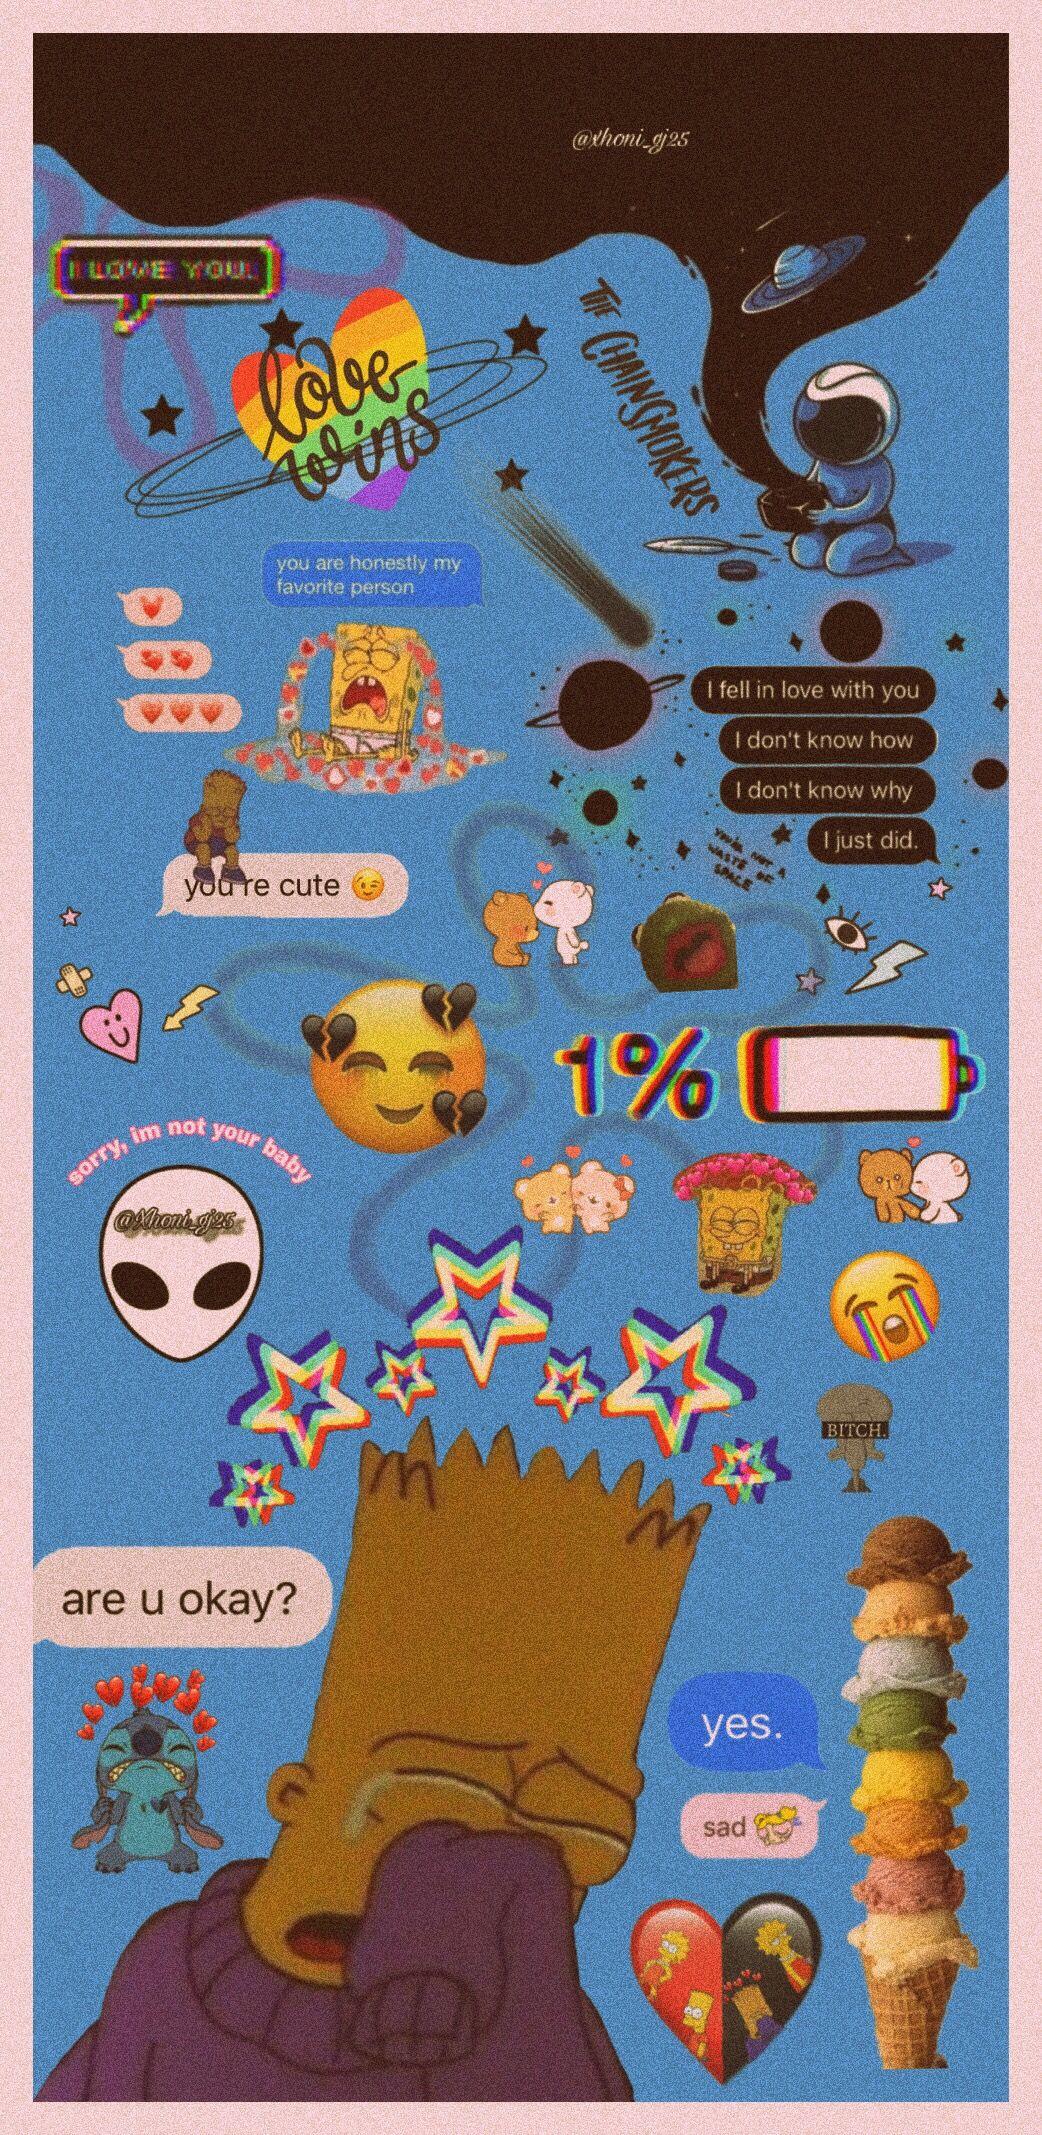 Please like, i send a lot of time in this peace of art 🙏🏻❤️  #interesting #art #sad #simpsons #love #sadlove #brokenhearts #cry #black #space #star #stitch #spongebob #patrickstar #loveislove #hurt #astroid #freetoedit #1percent #1